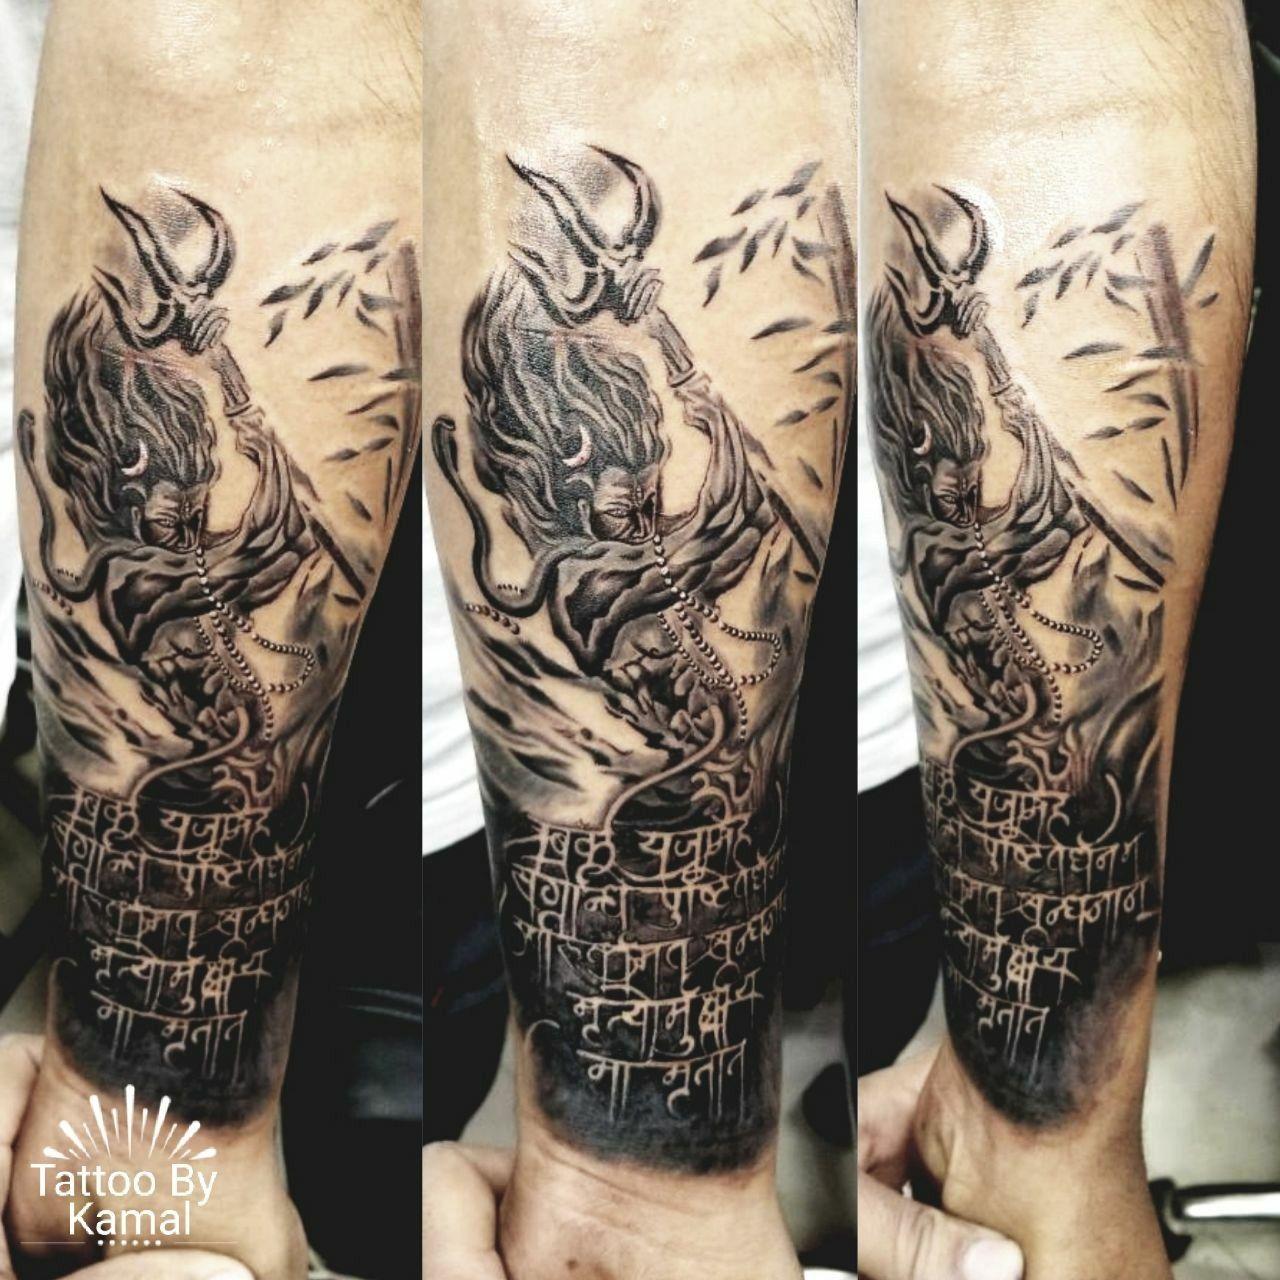 Lord Shiva Tattoo Shiva Shuiv Ji Shiva Tattoo Design Tattoos Shiva Tattoo